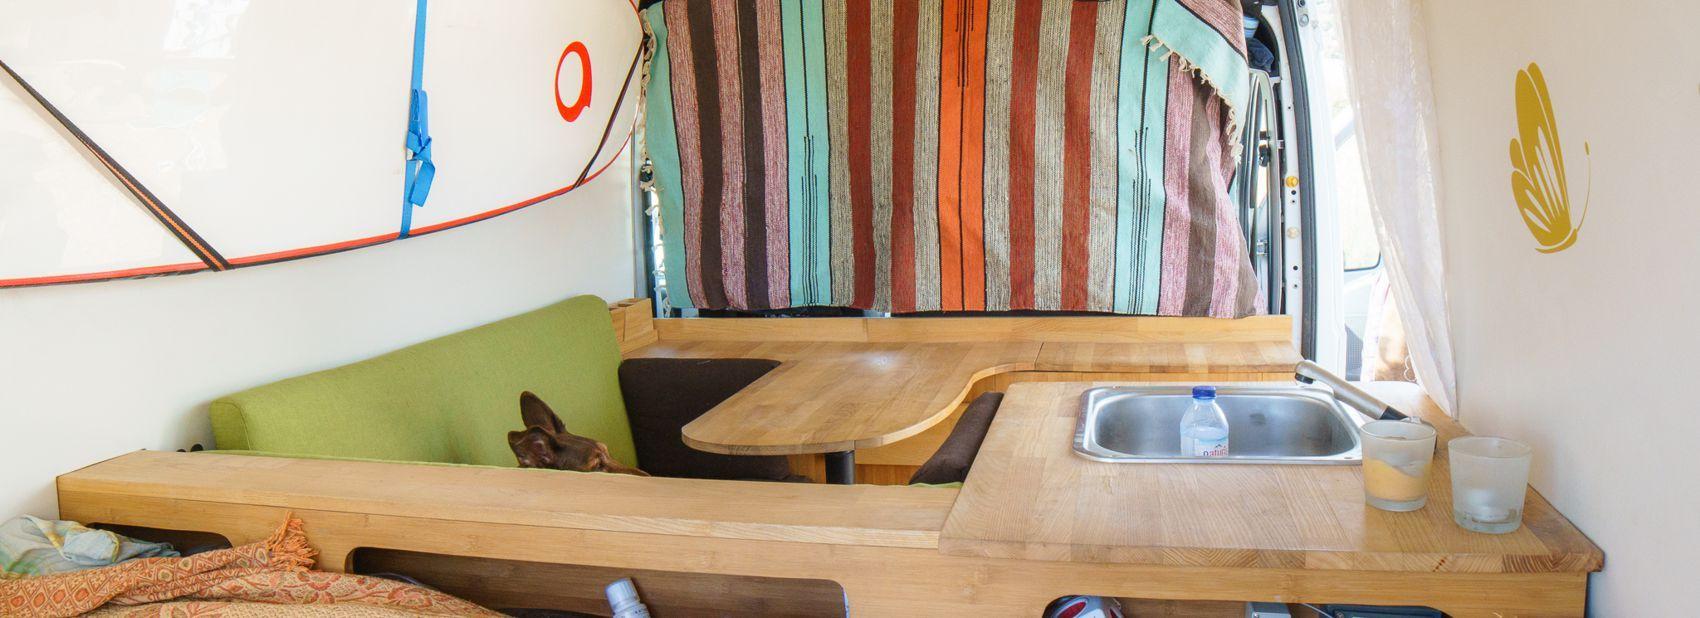 wohnmobilausbau wohnmobil selber ausbauen camper. Black Bedroom Furniture Sets. Home Design Ideas